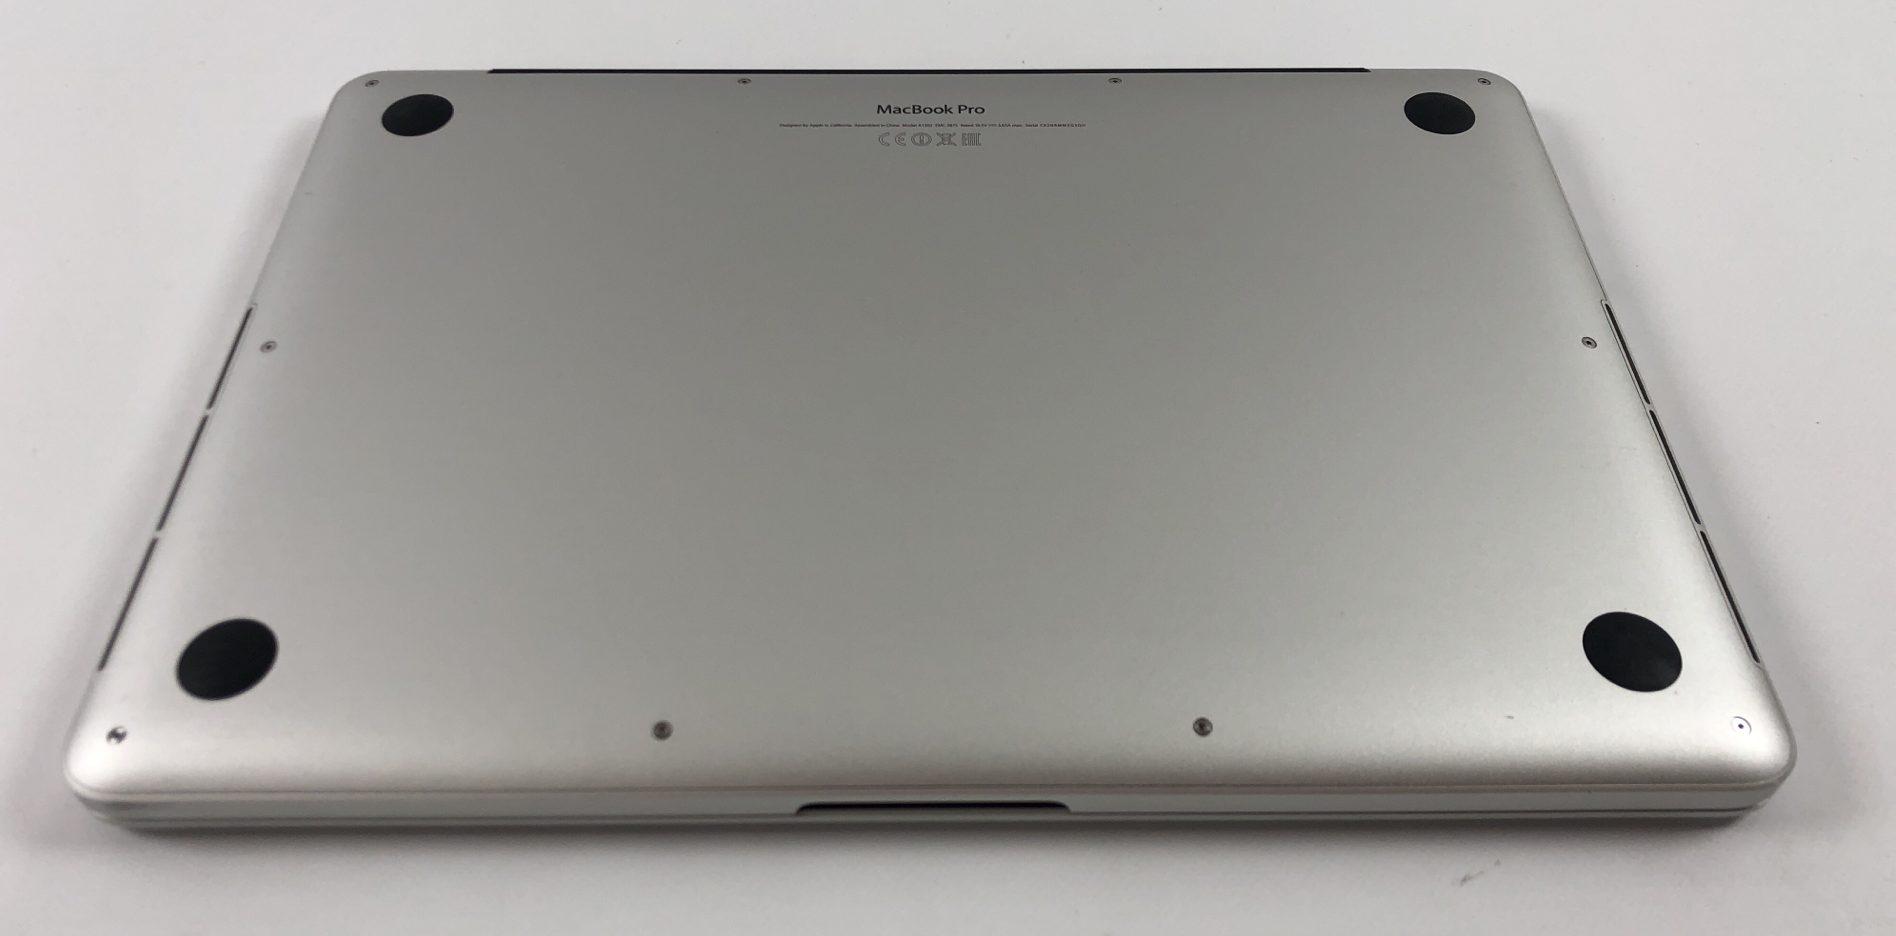 "MacBook Pro Retina 13"" Mid 2014 (Intel Core i5 2.6 GHz 8 GB RAM 128 GB SSD), Intel Core i5 2.6 GHz, 8 GB RAM, 128 GB SSD, Kuva 4"